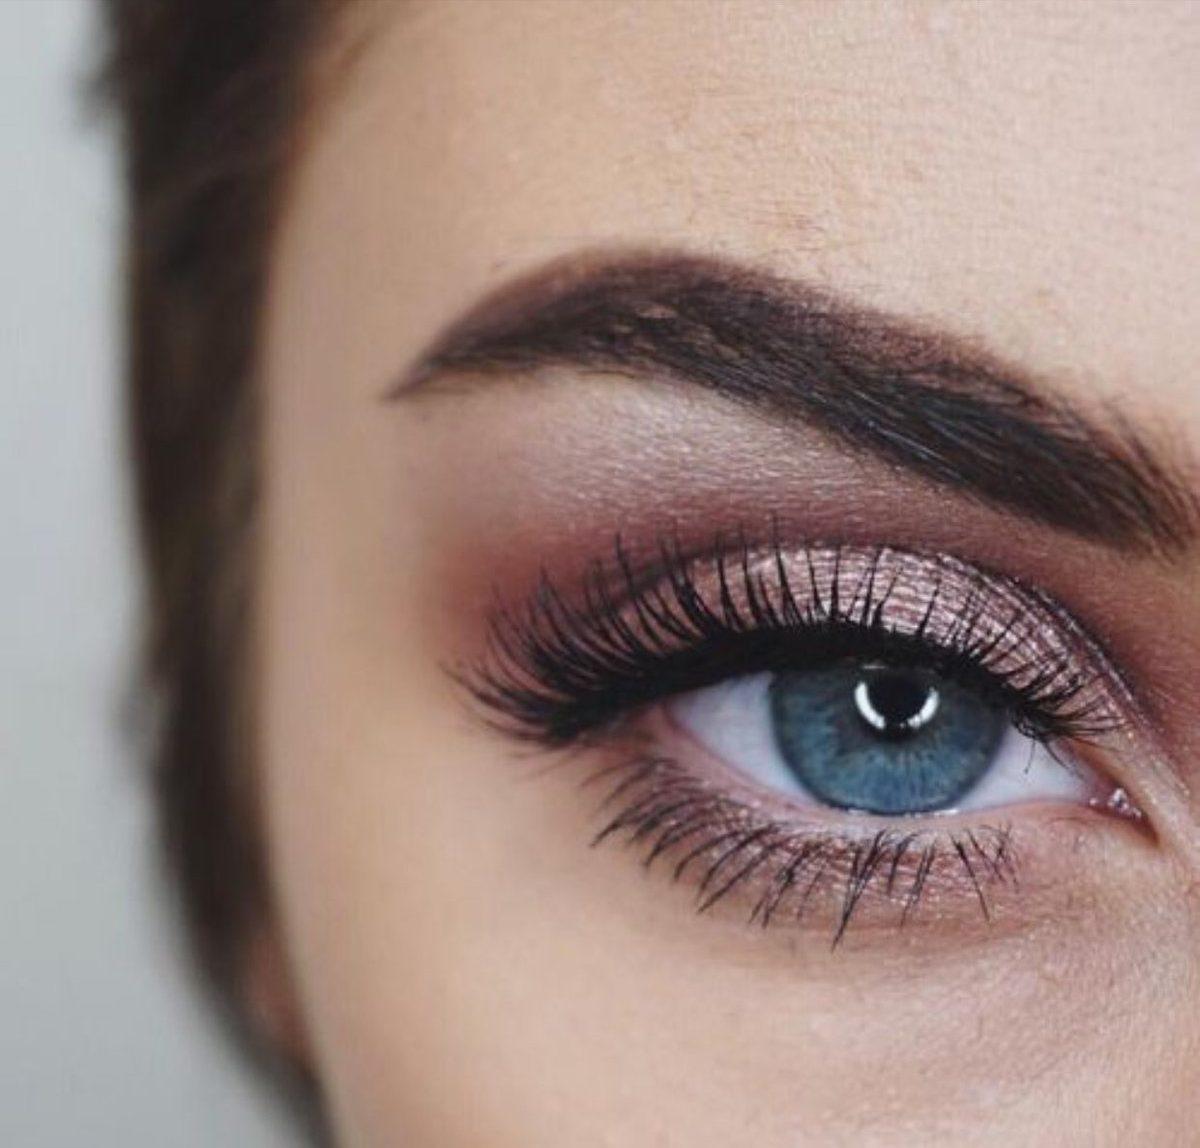 Sombra rosé + cílios definidos e sobrancelha power